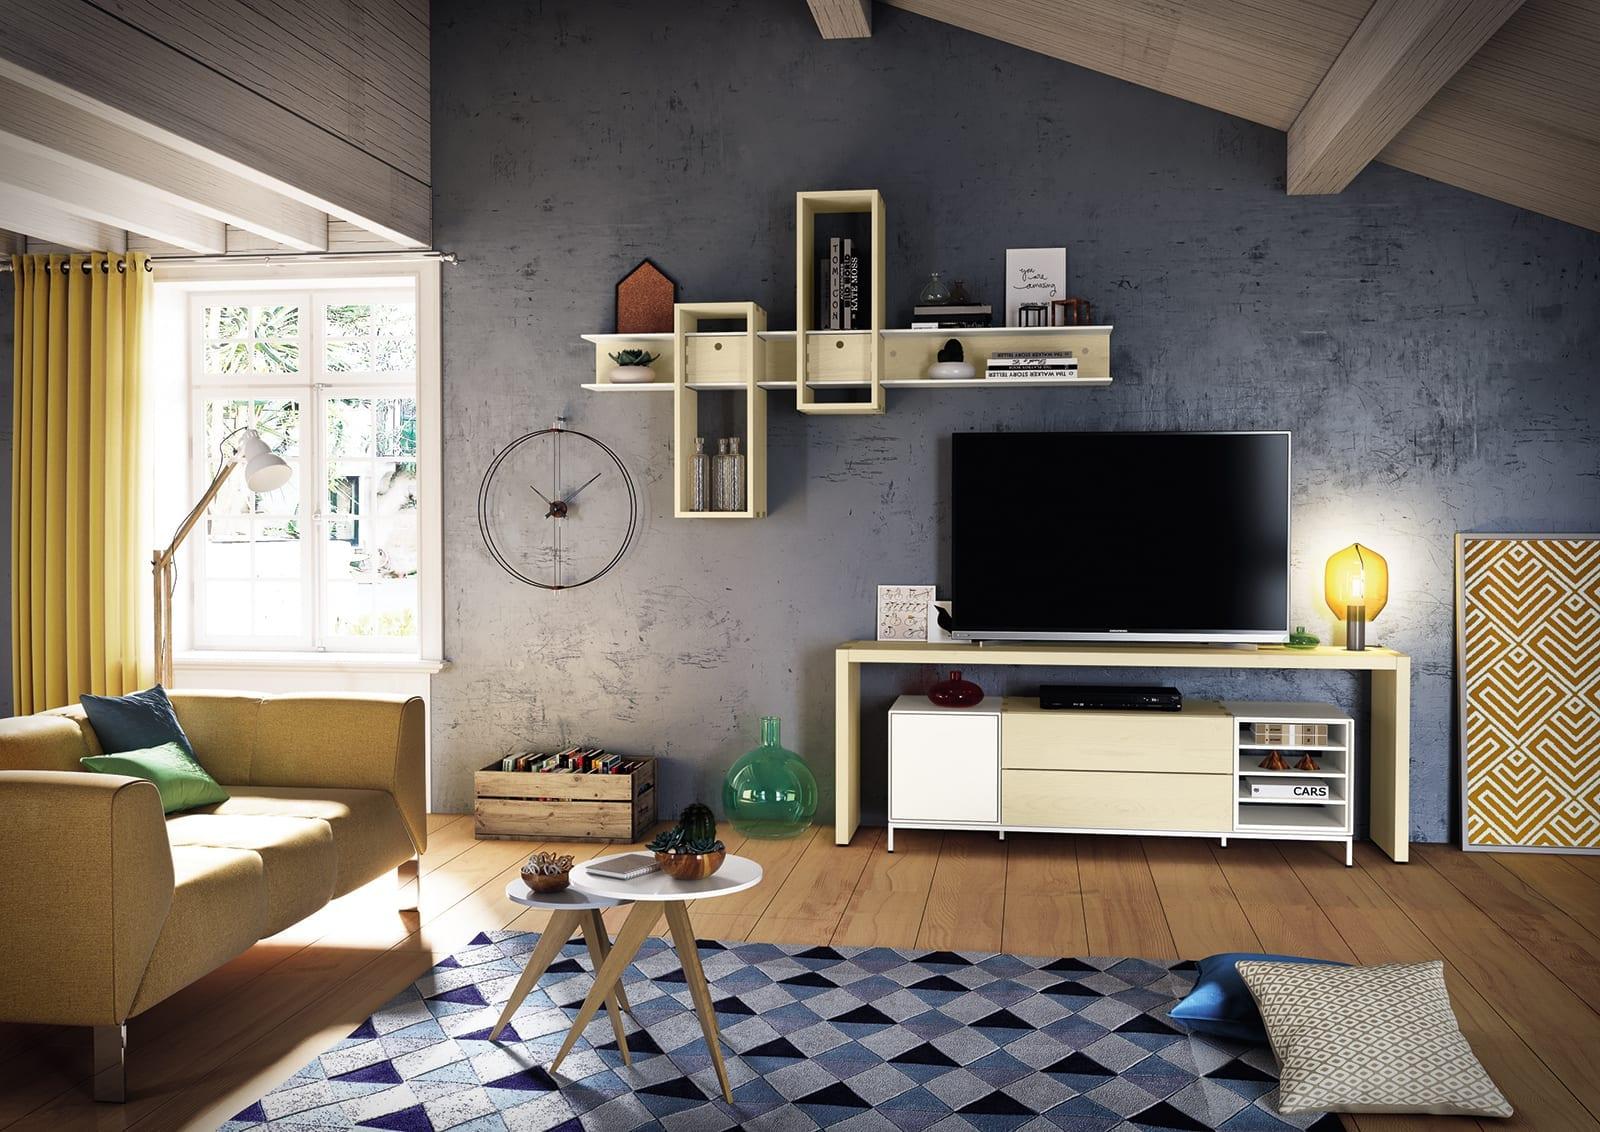 h lsta ct71 kerek kombin lhat asztalka kicsi. Black Bedroom Furniture Sets. Home Design Ideas